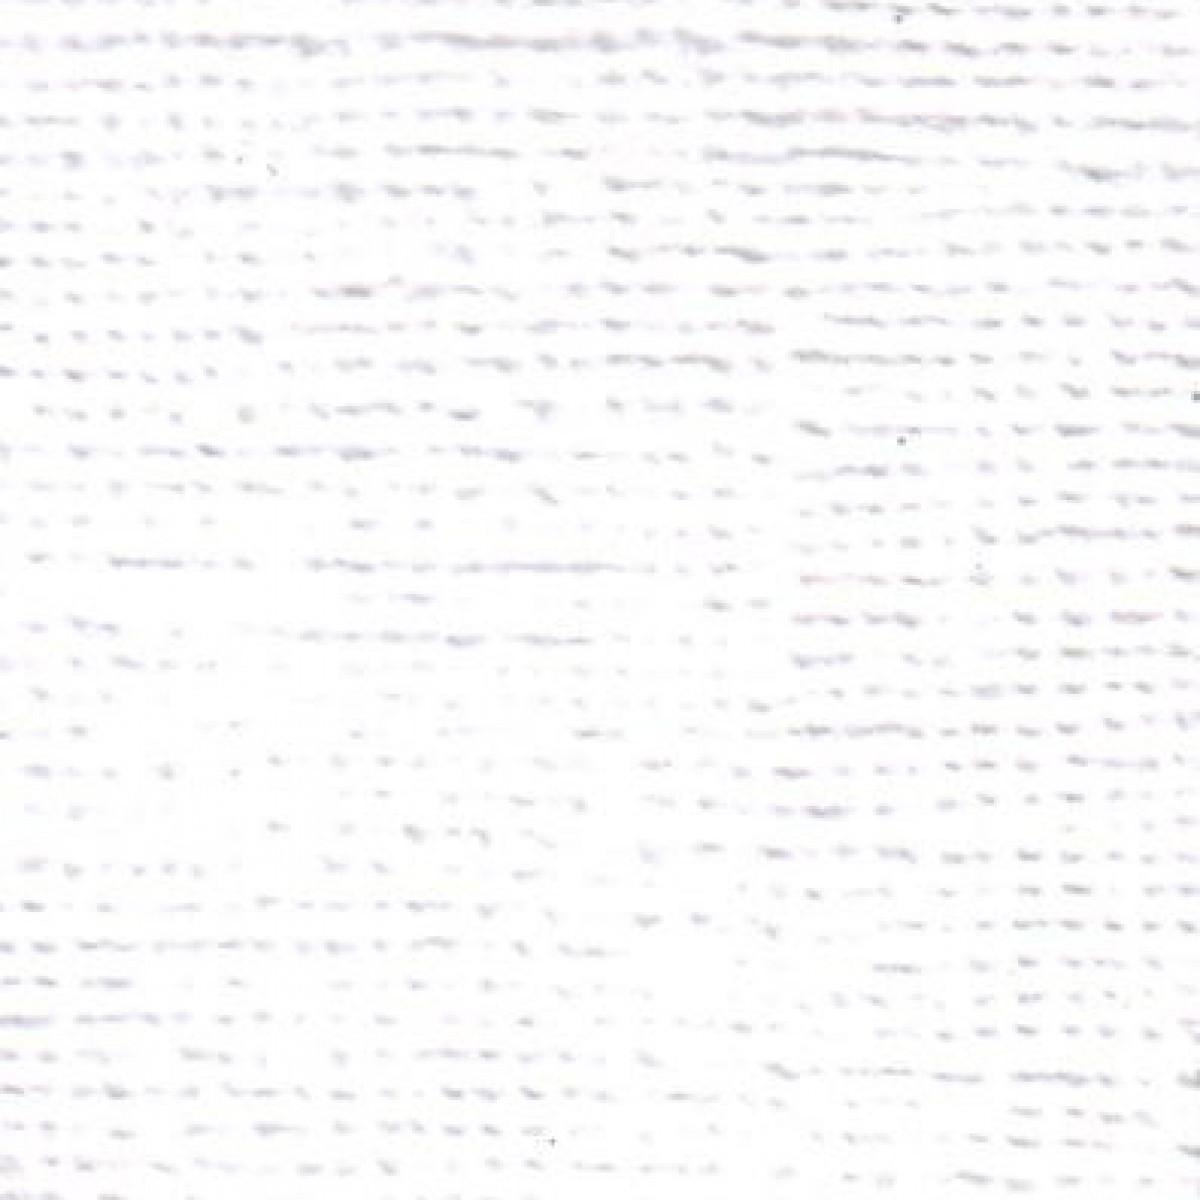 Papel Scrap Cardstock Branco Toke e Crie - 8402 - PCAR021